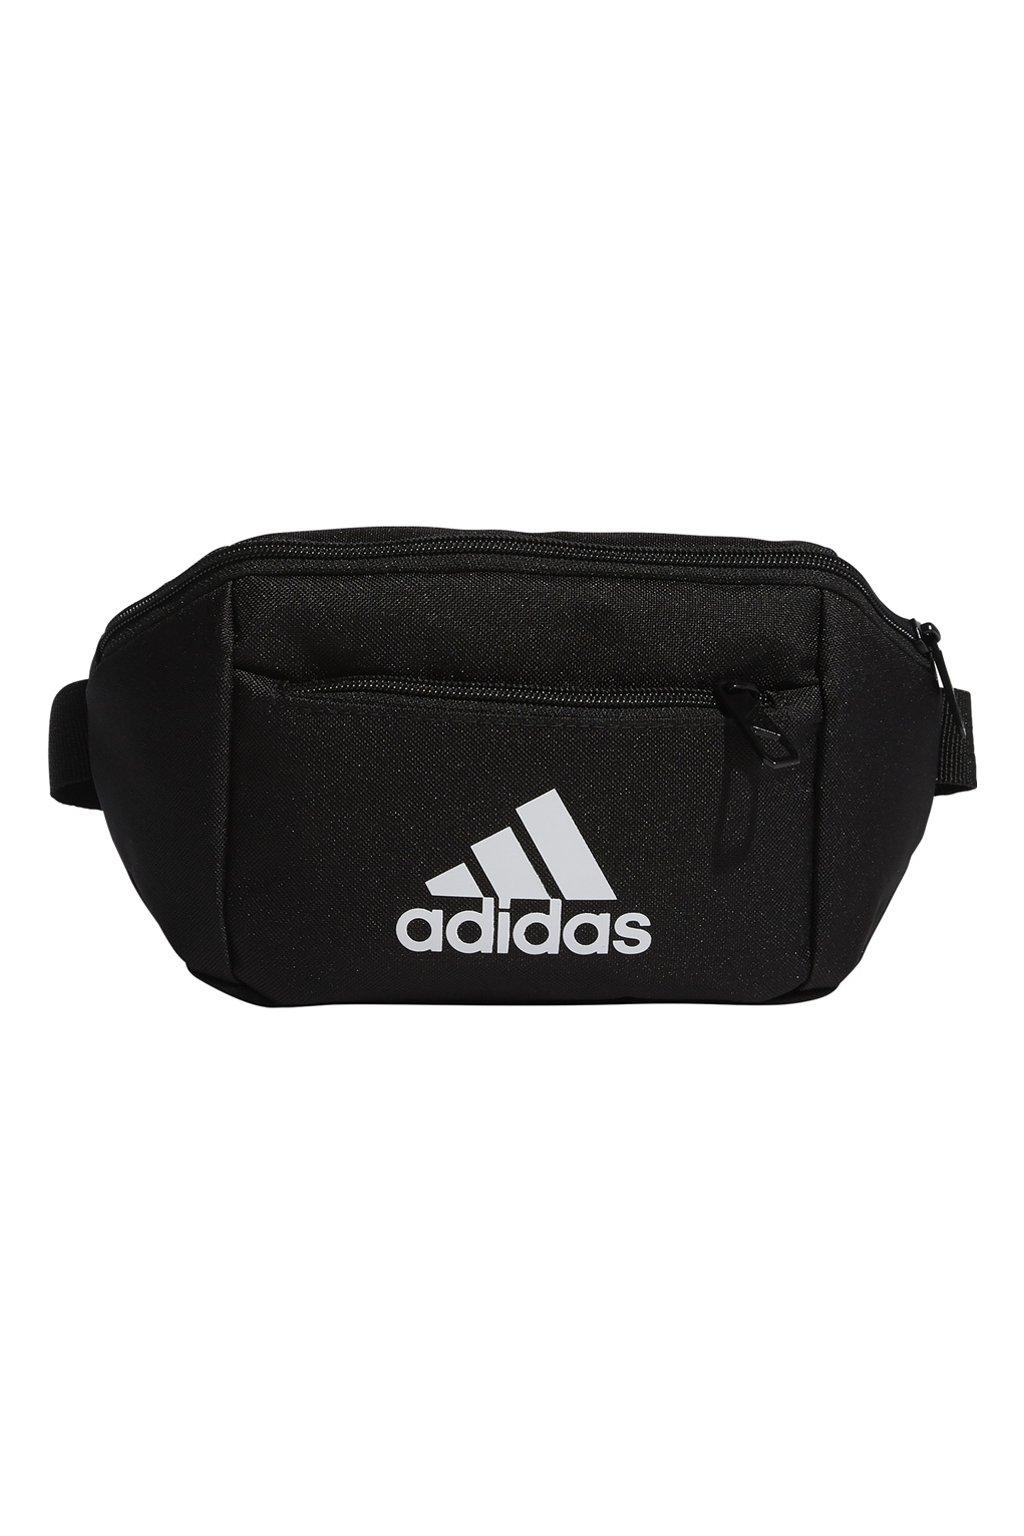 Ľadvinka Adidas EC WB čierna ED6876